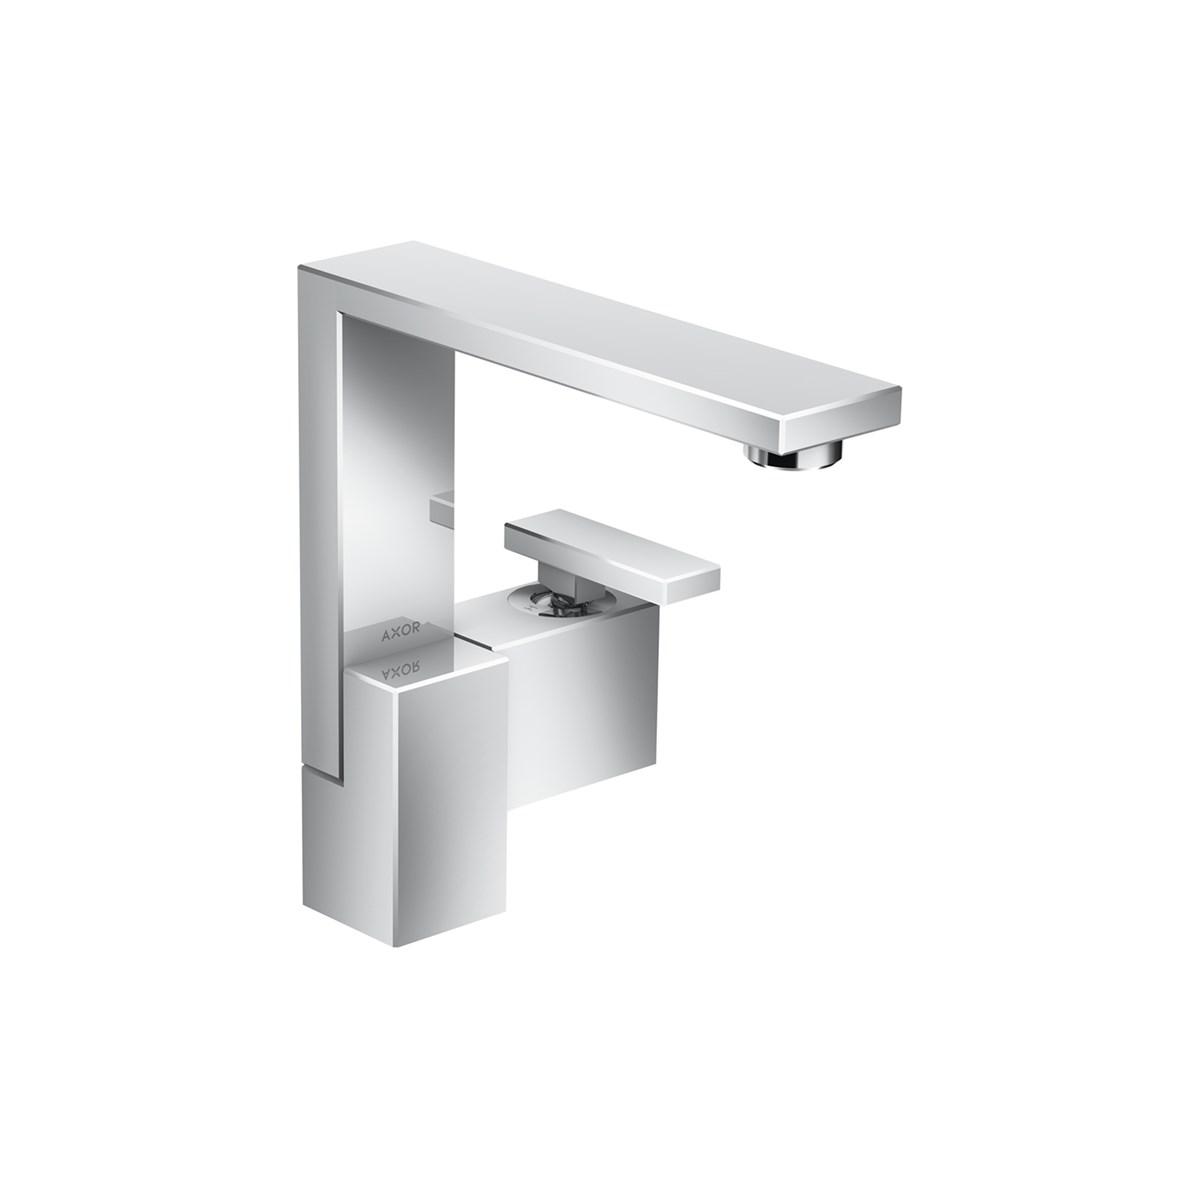 Hansgrohe-Jean-Marie-Massaud-AXOR-Edge-Basin-Mixer-190-46020000-Matisse-1